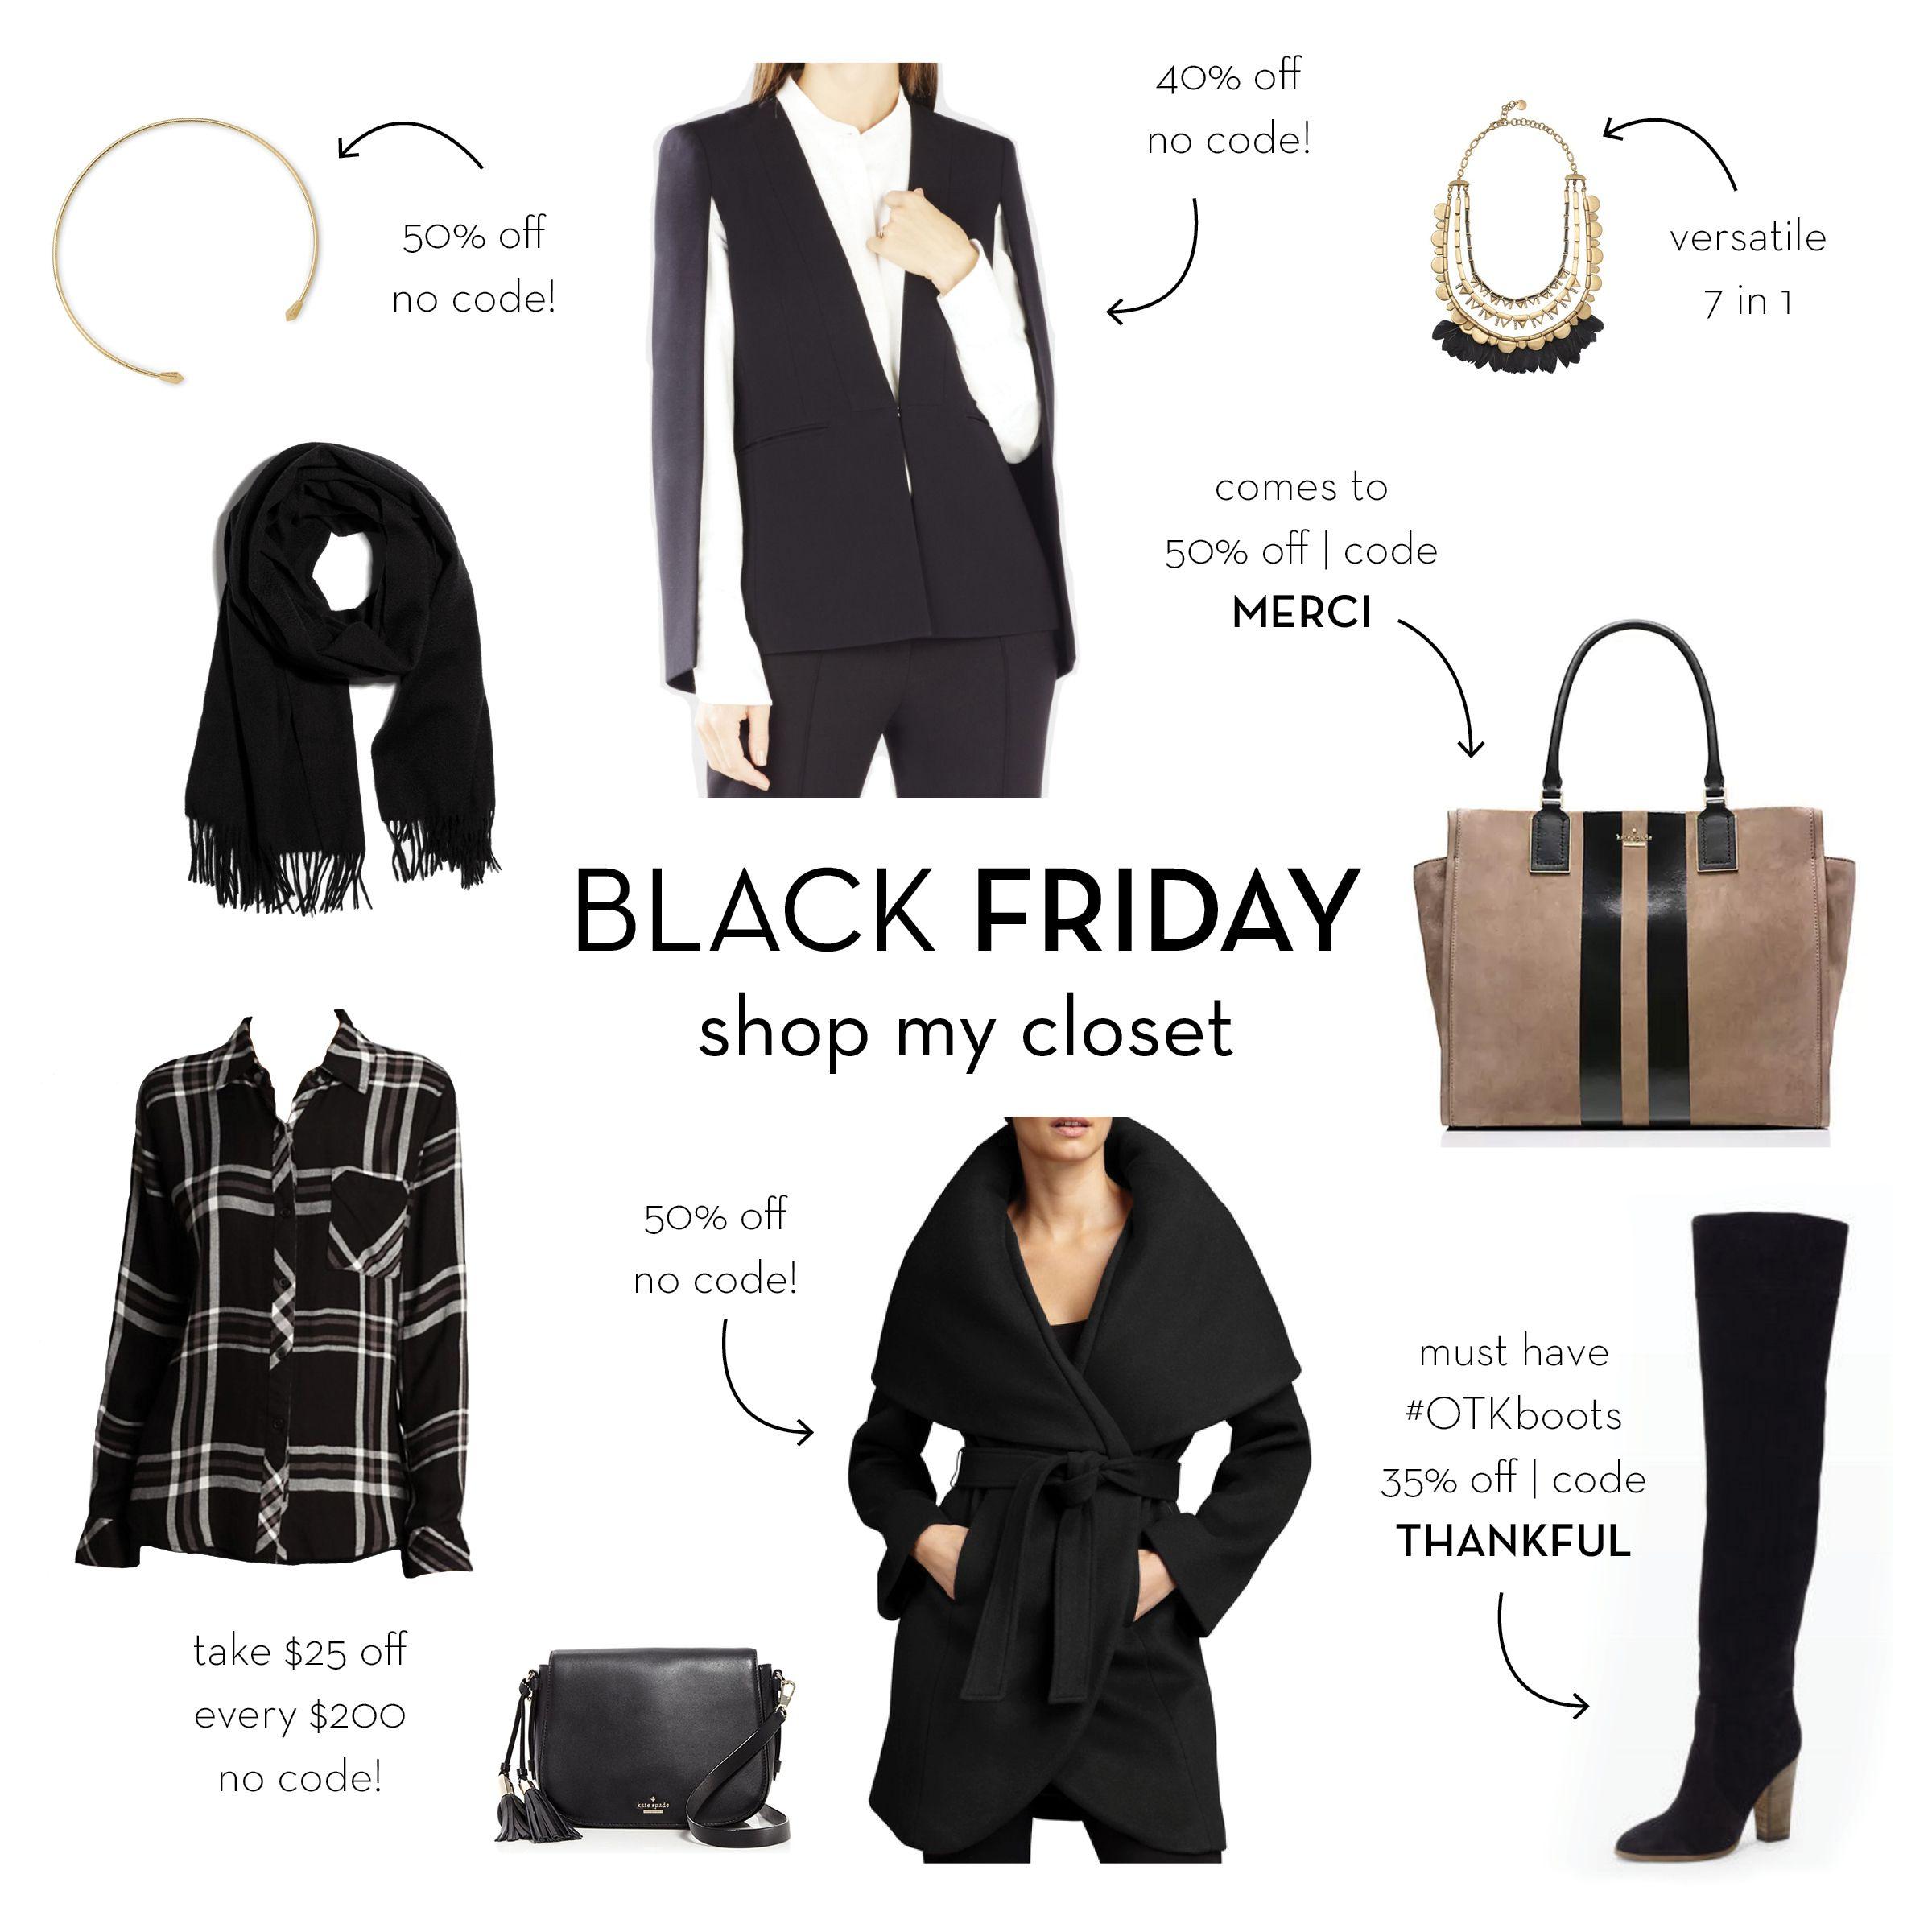 www.justjem.com (follow on insta & twitter @ emilysklar) #blackfriday #giftguide  #blackcoat #wrapcoat #blazer #cape #blazercape #bcbg #upascape #rails #flannel #katespade #otkboots